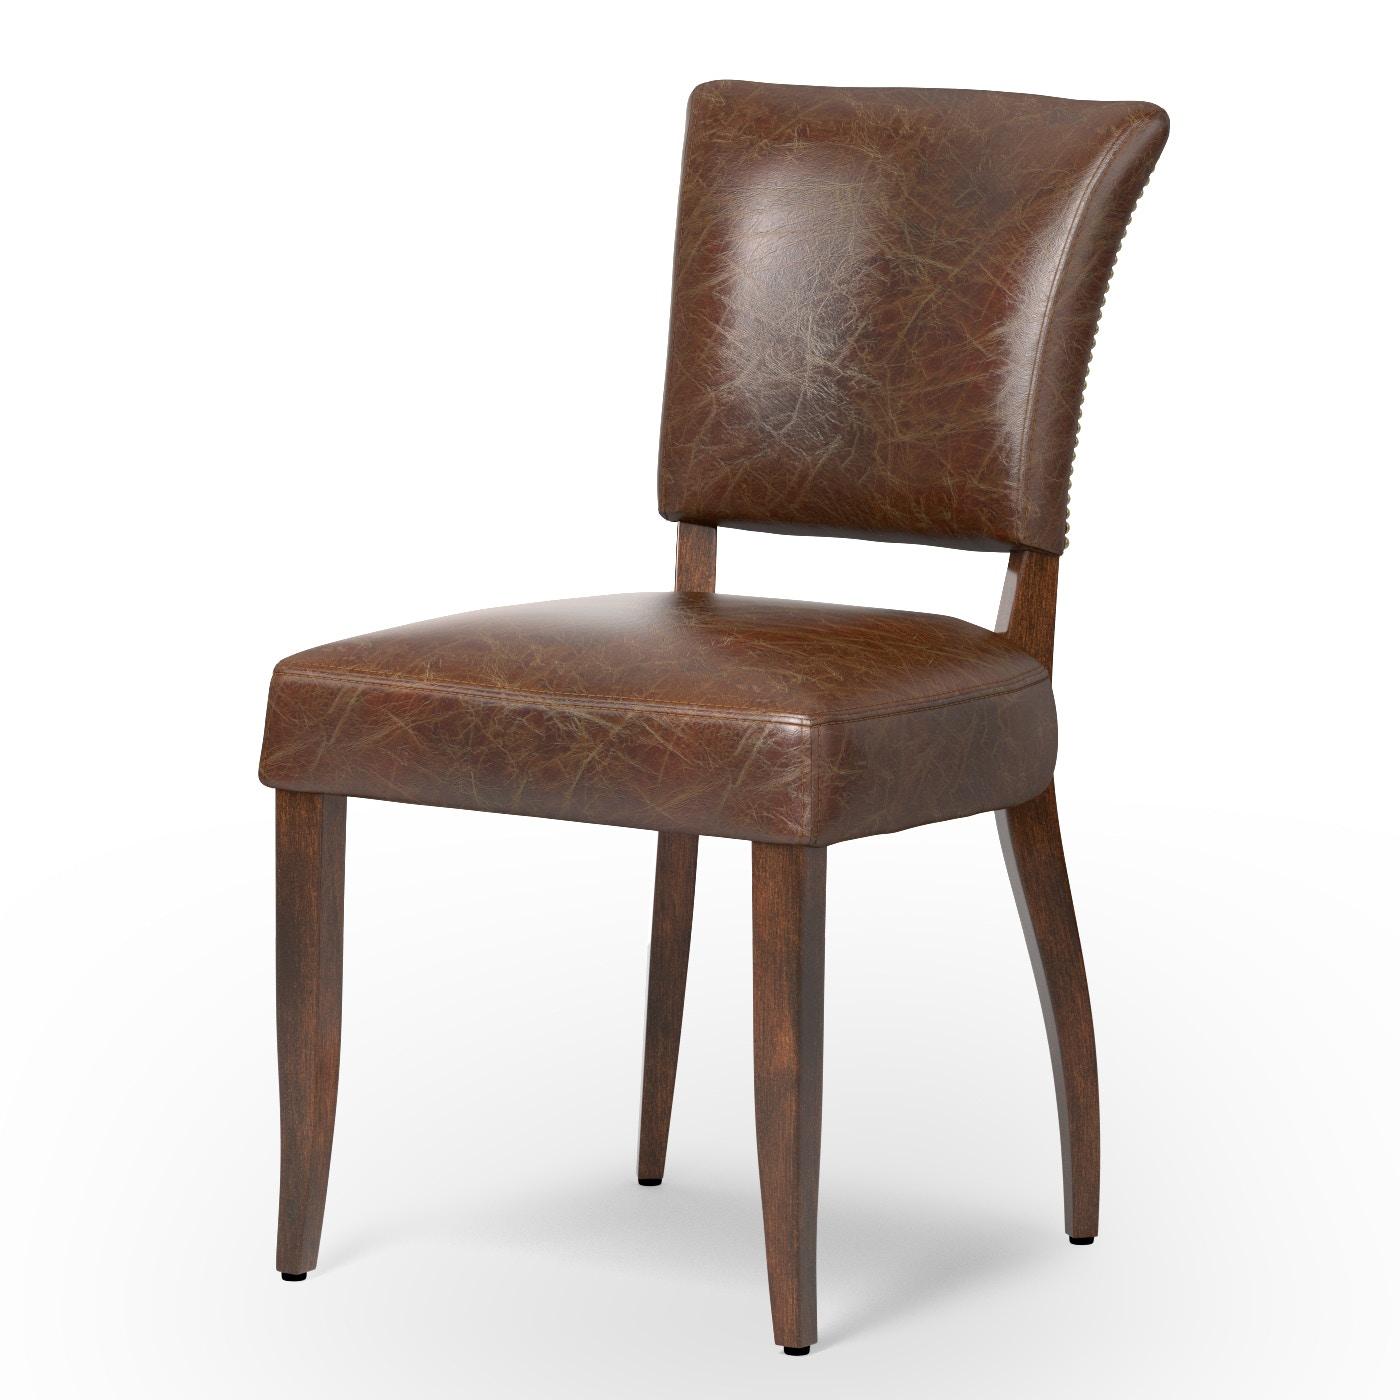 antique oak dining chairs wedding chair covers basingstoke four hands furniture ccar m3 bkt room mimi biker tan carnegie